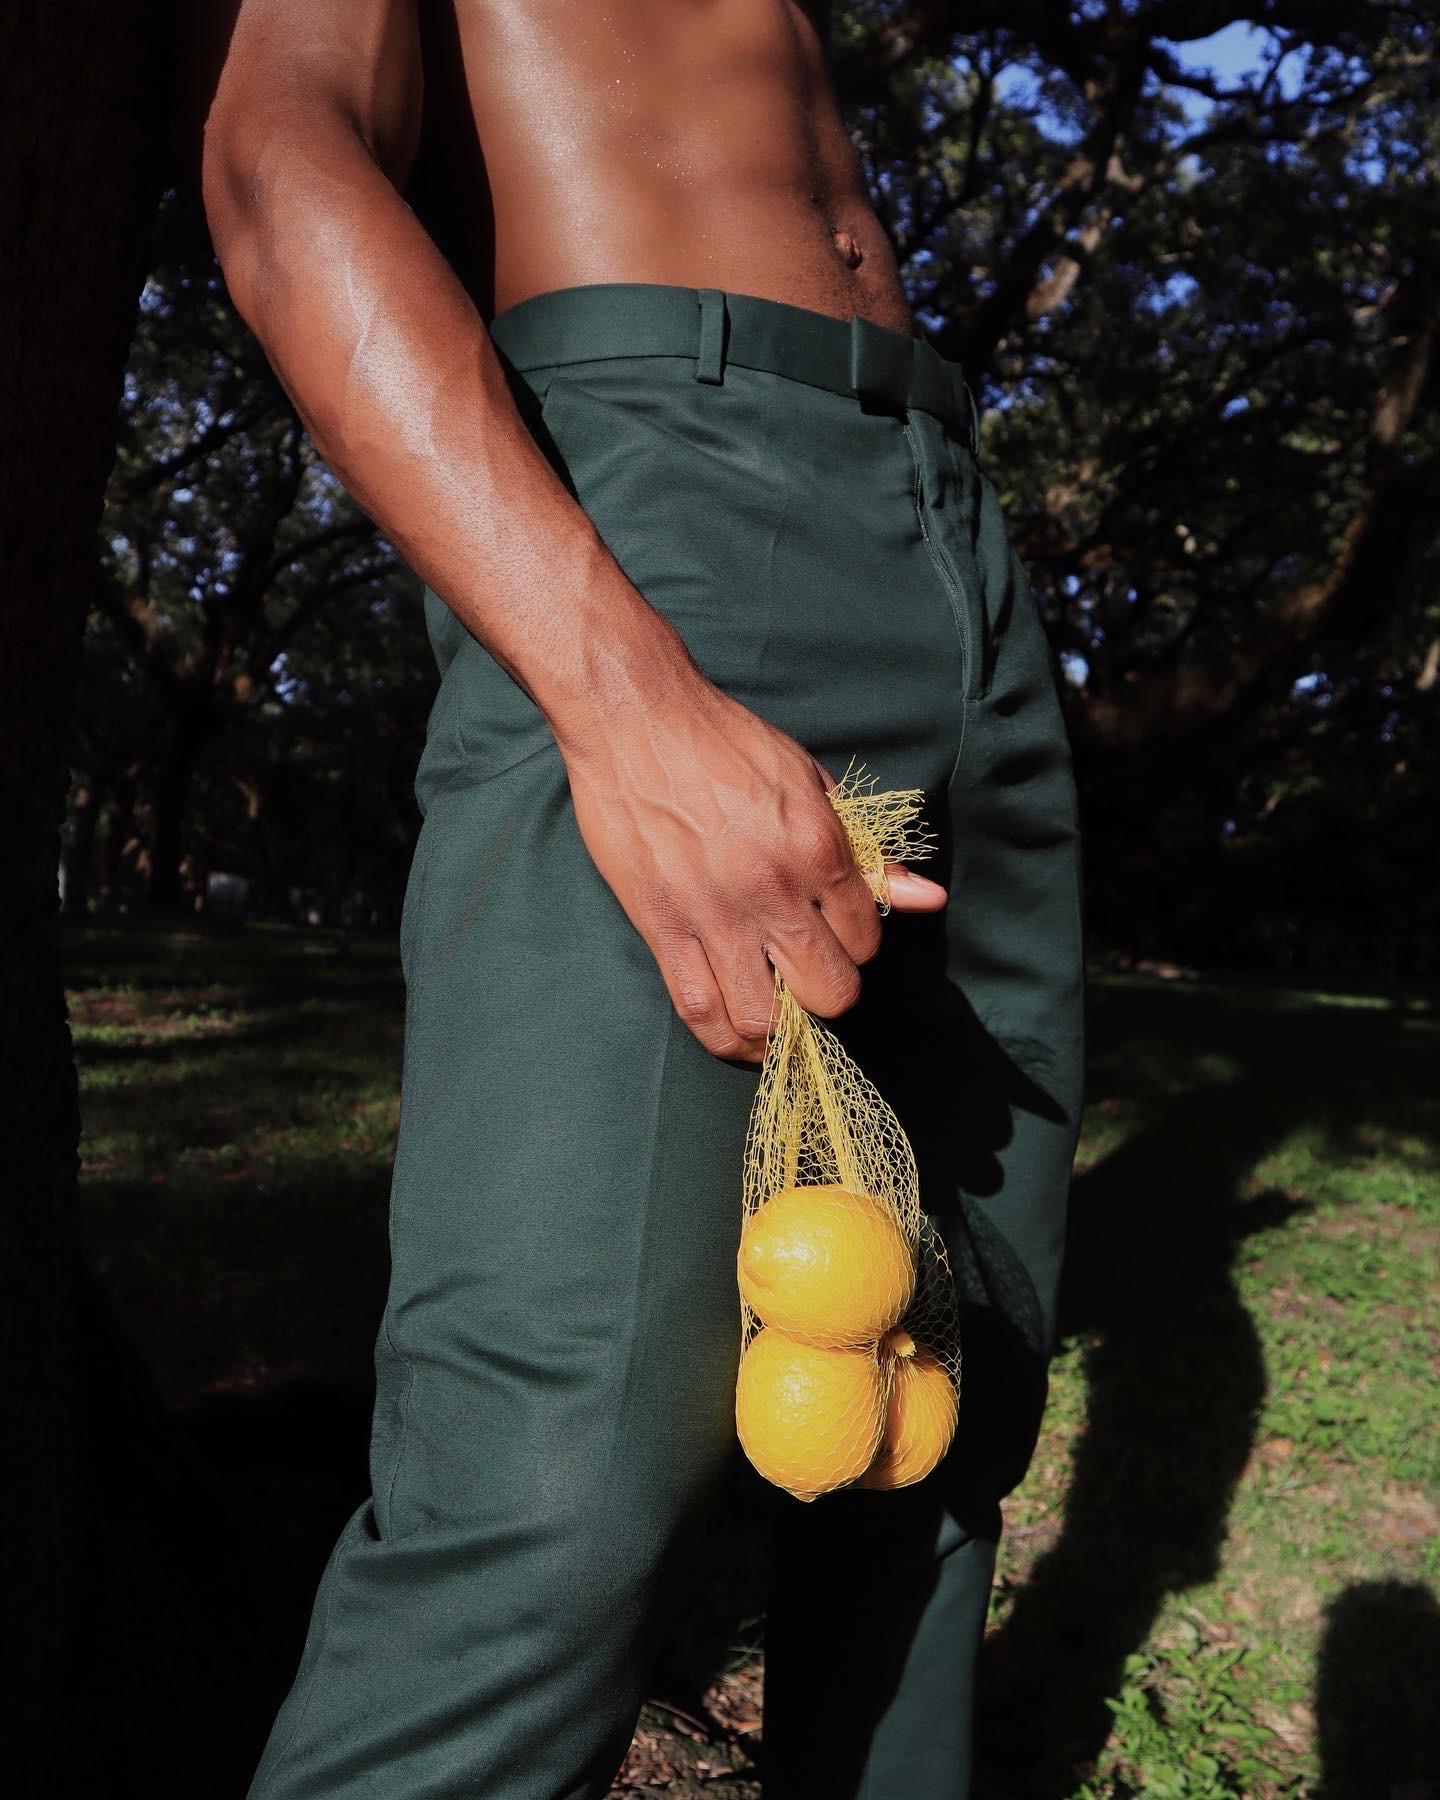 Bring Your Own Lemons